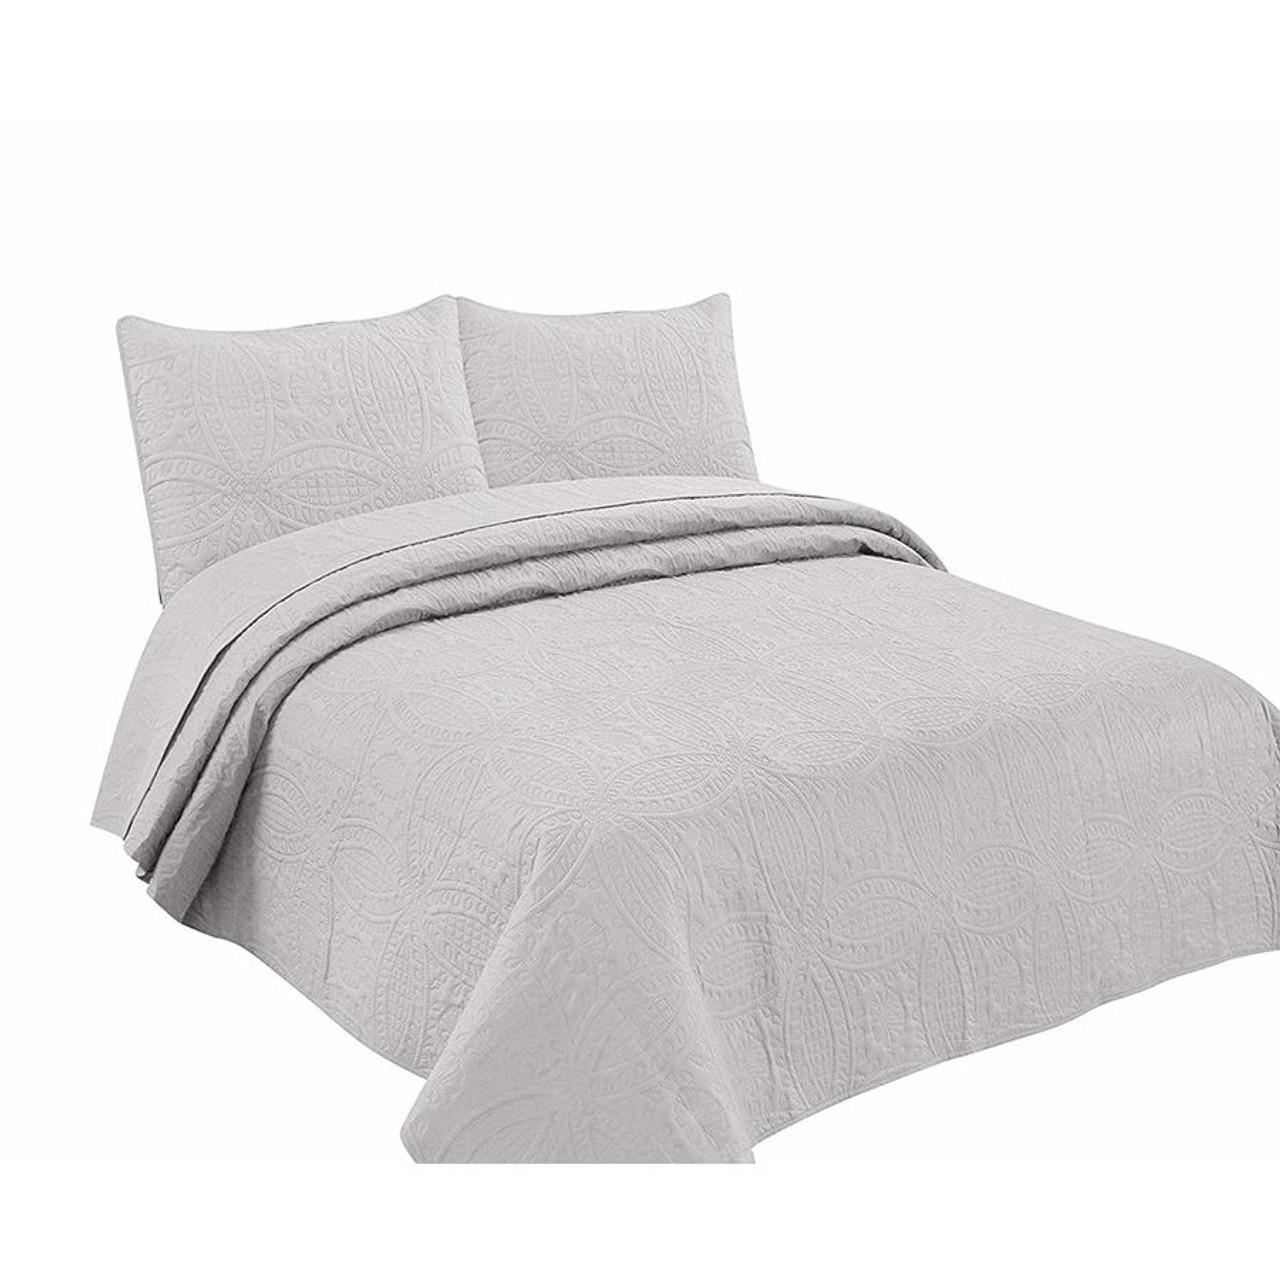 3 Pc Oversized Bedspread Coverlet Set Grey Color